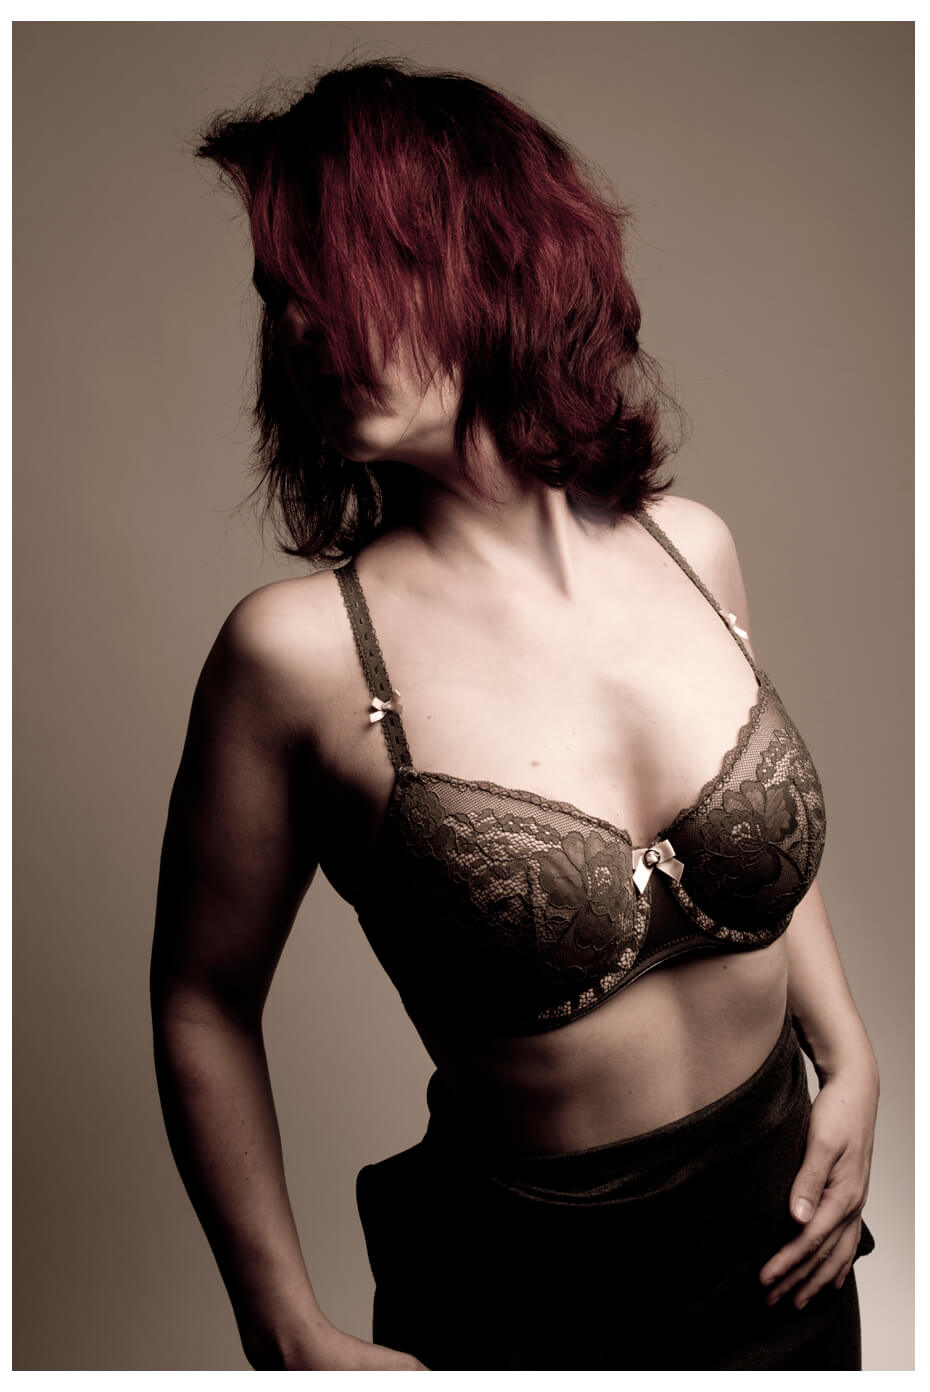 erotisches Fotoshooting, BH farbig